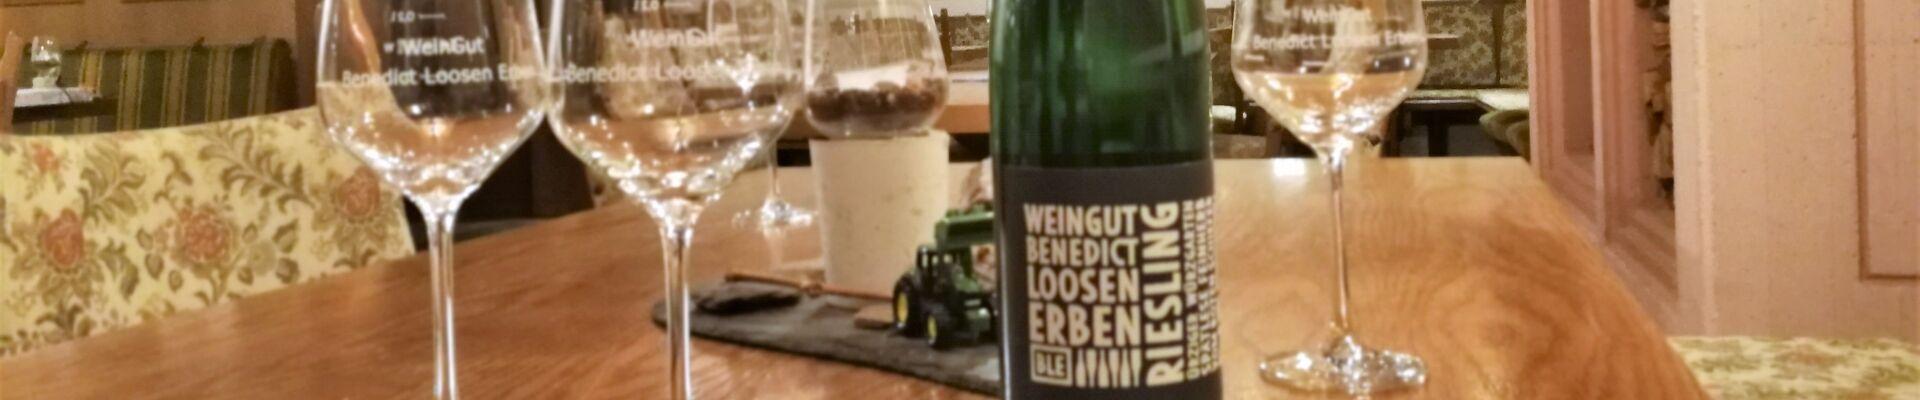 Weinprobe mit dem WeinGut Benedict Loosen Erben